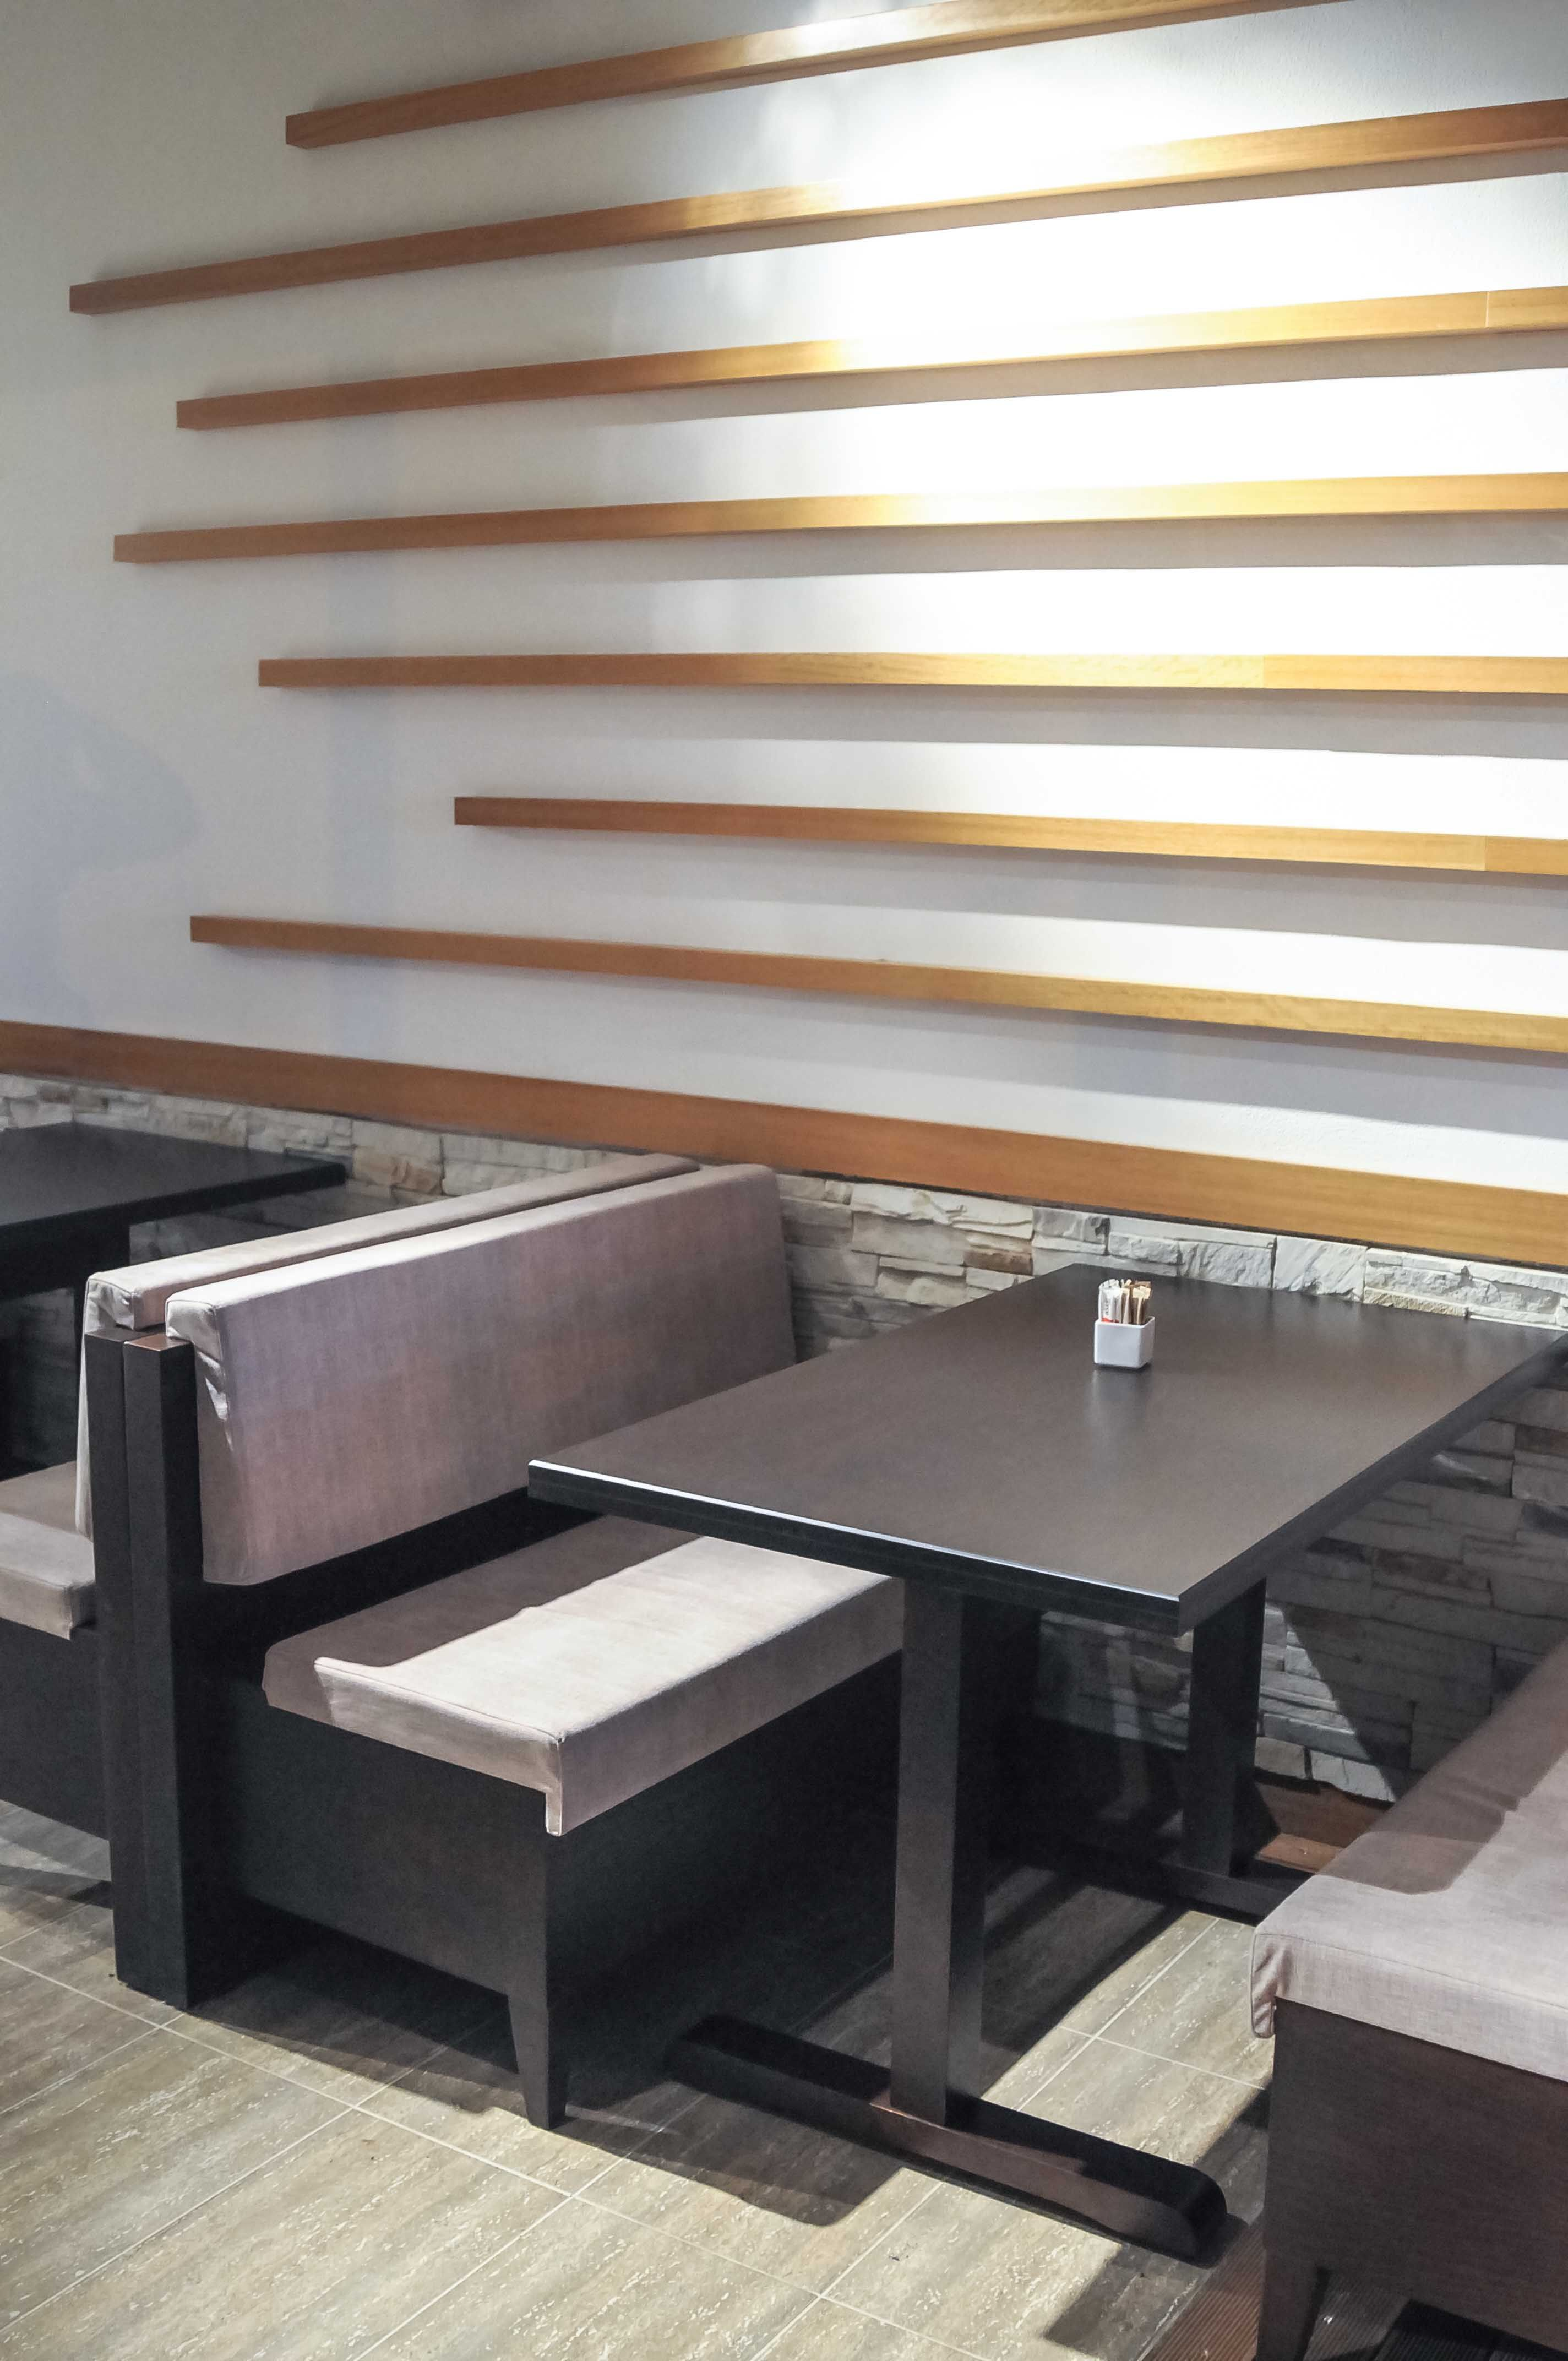 Sofa Design For Restaurant Restaurant Interior Sofa Design